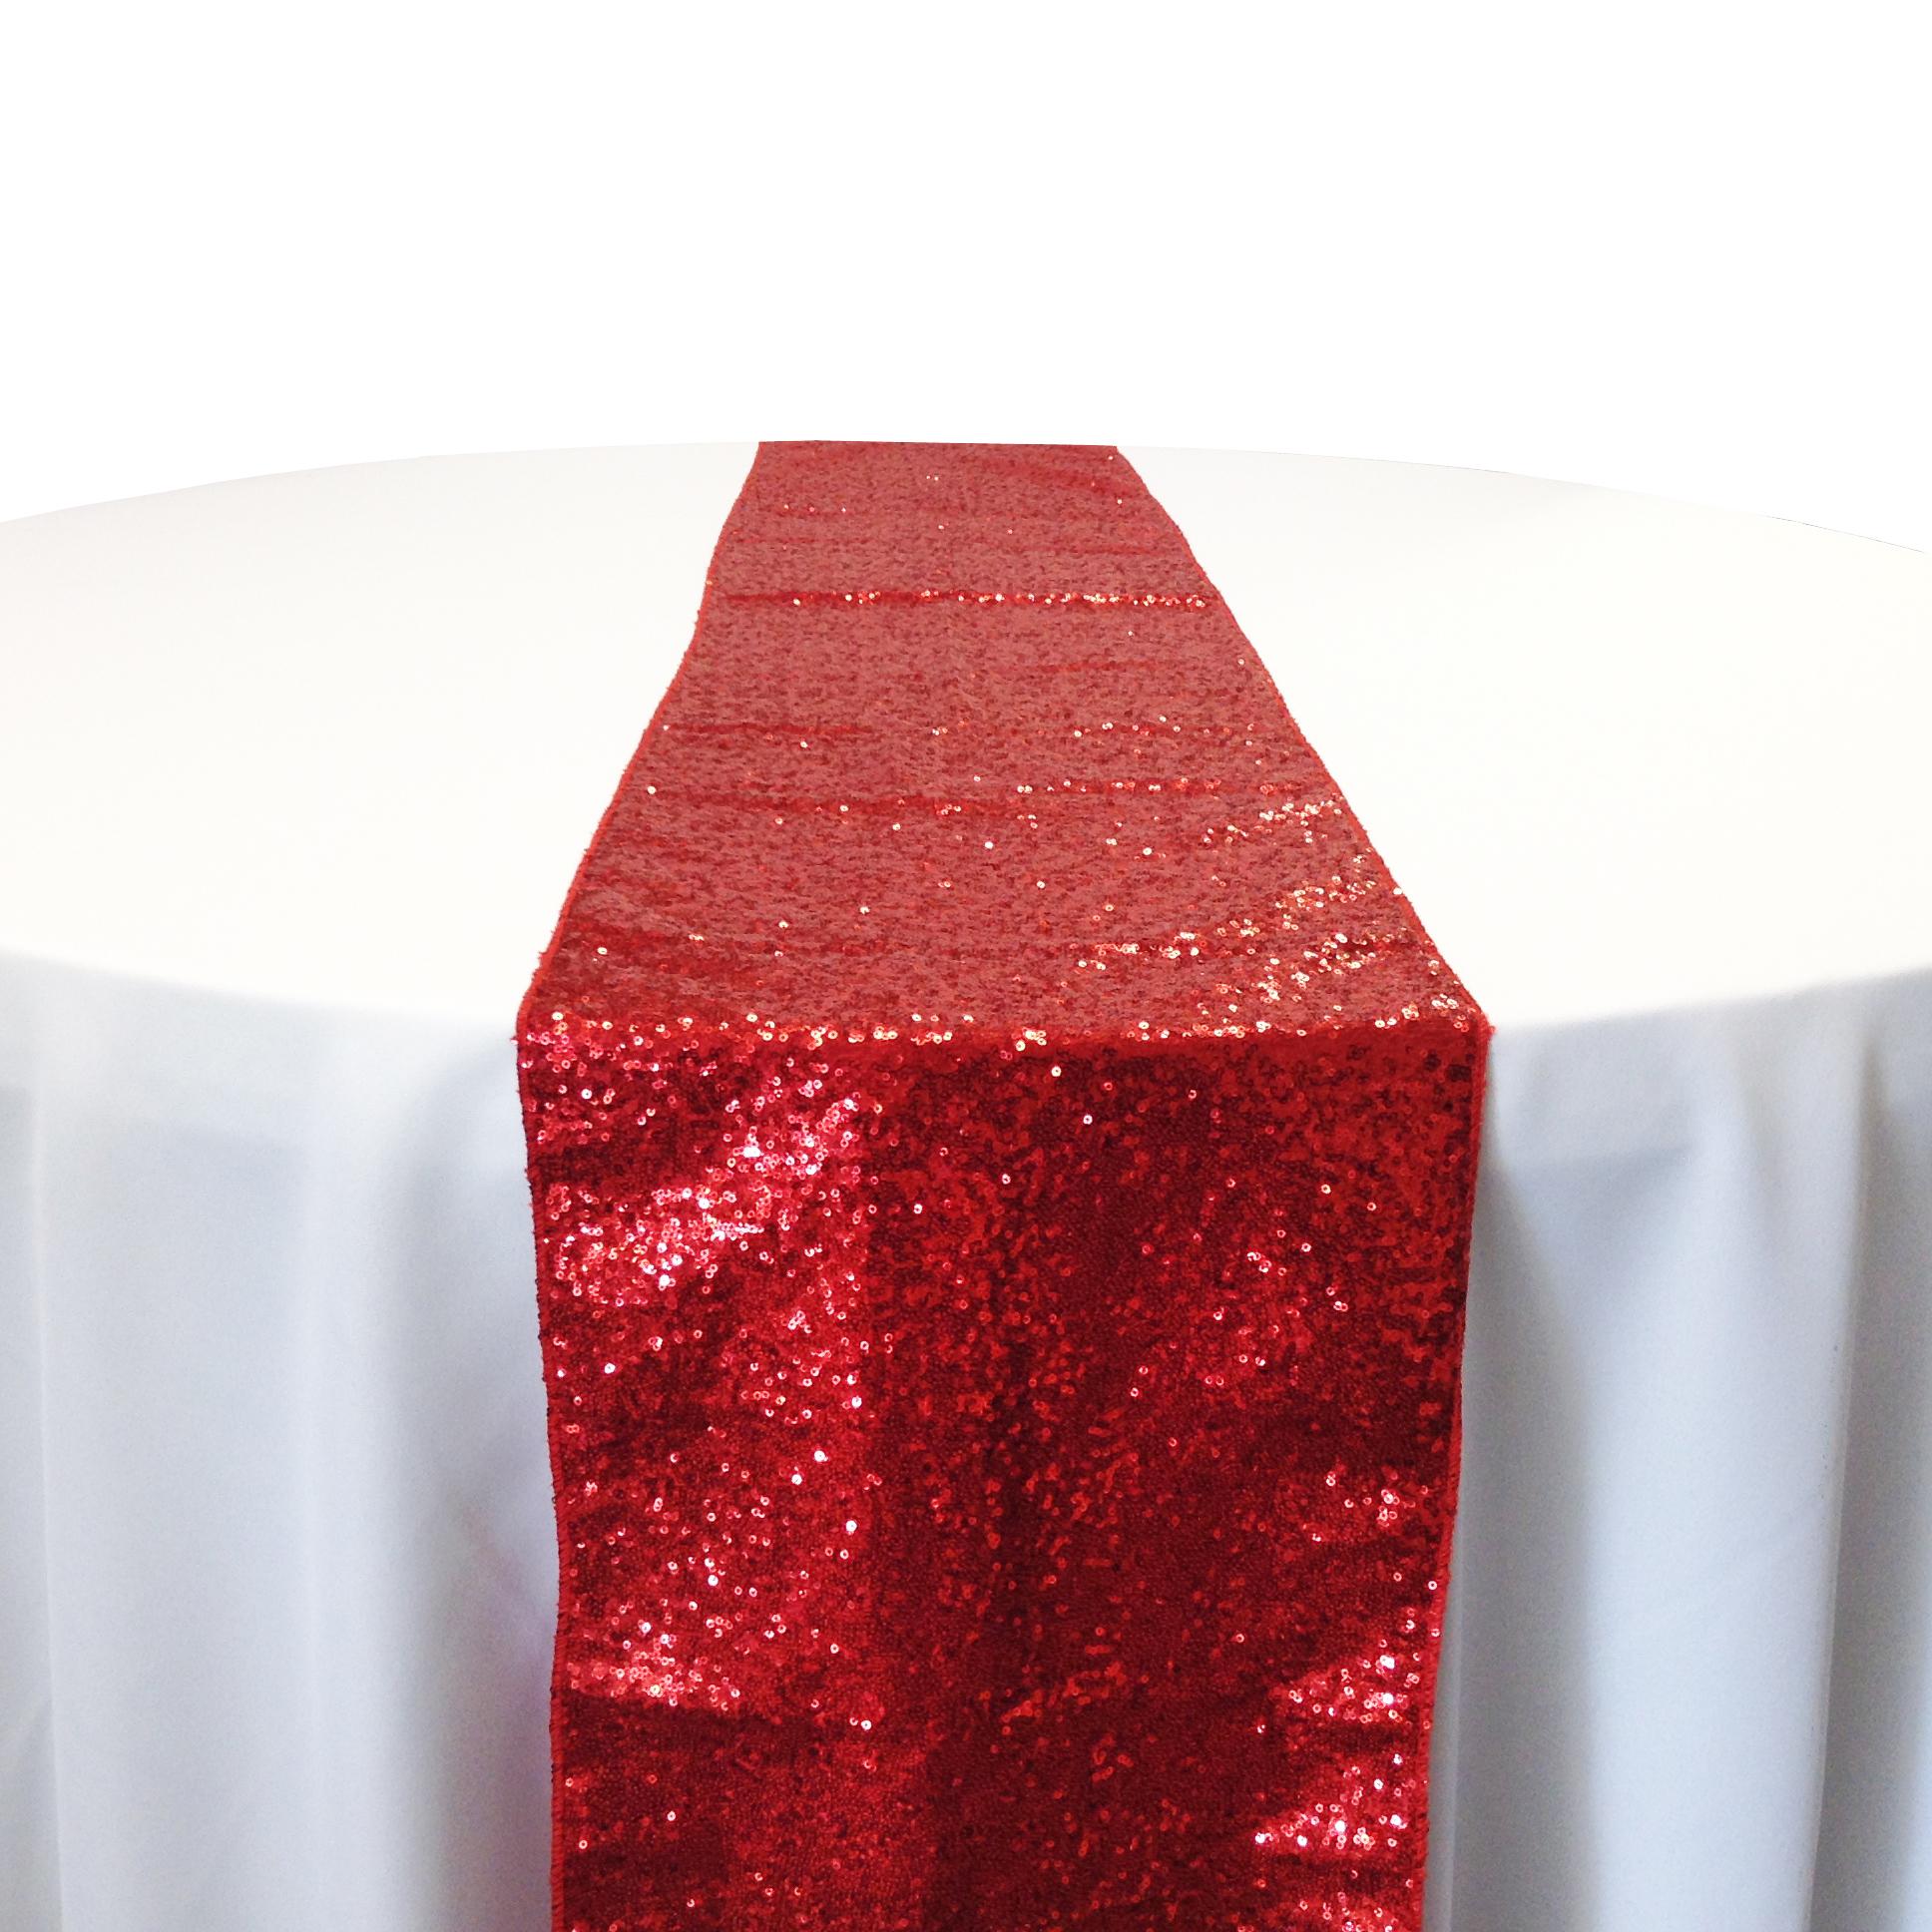 Red Taffeta Sequin Table Runner Rental Red Taffeta Glitz Table Runner Rental